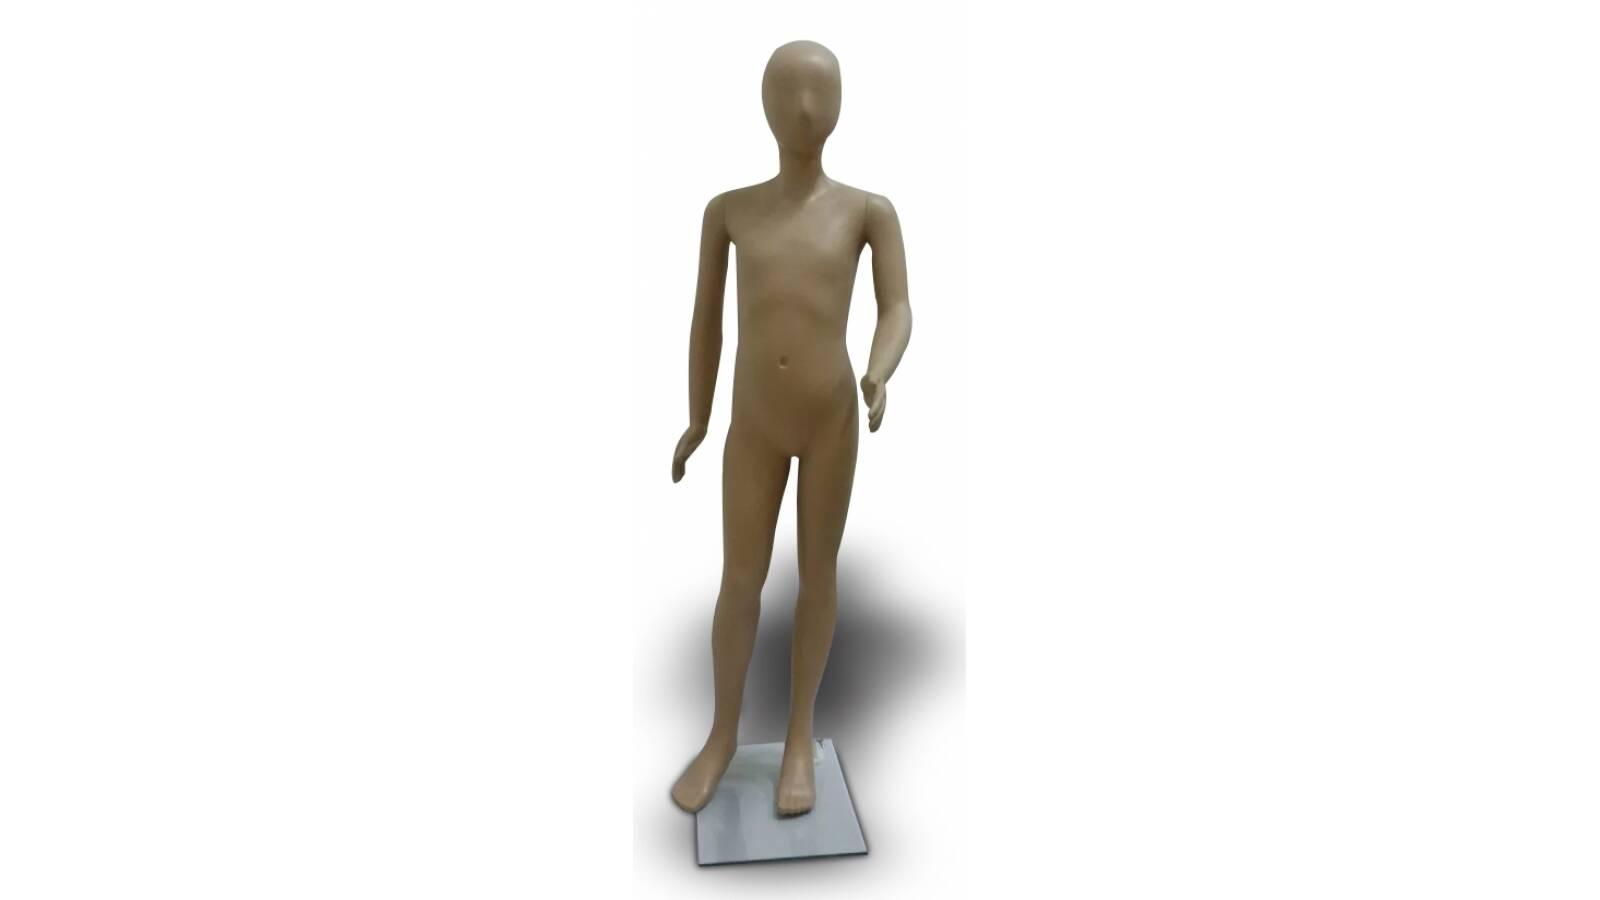 Maniqui de niño. 110 cm de altura.